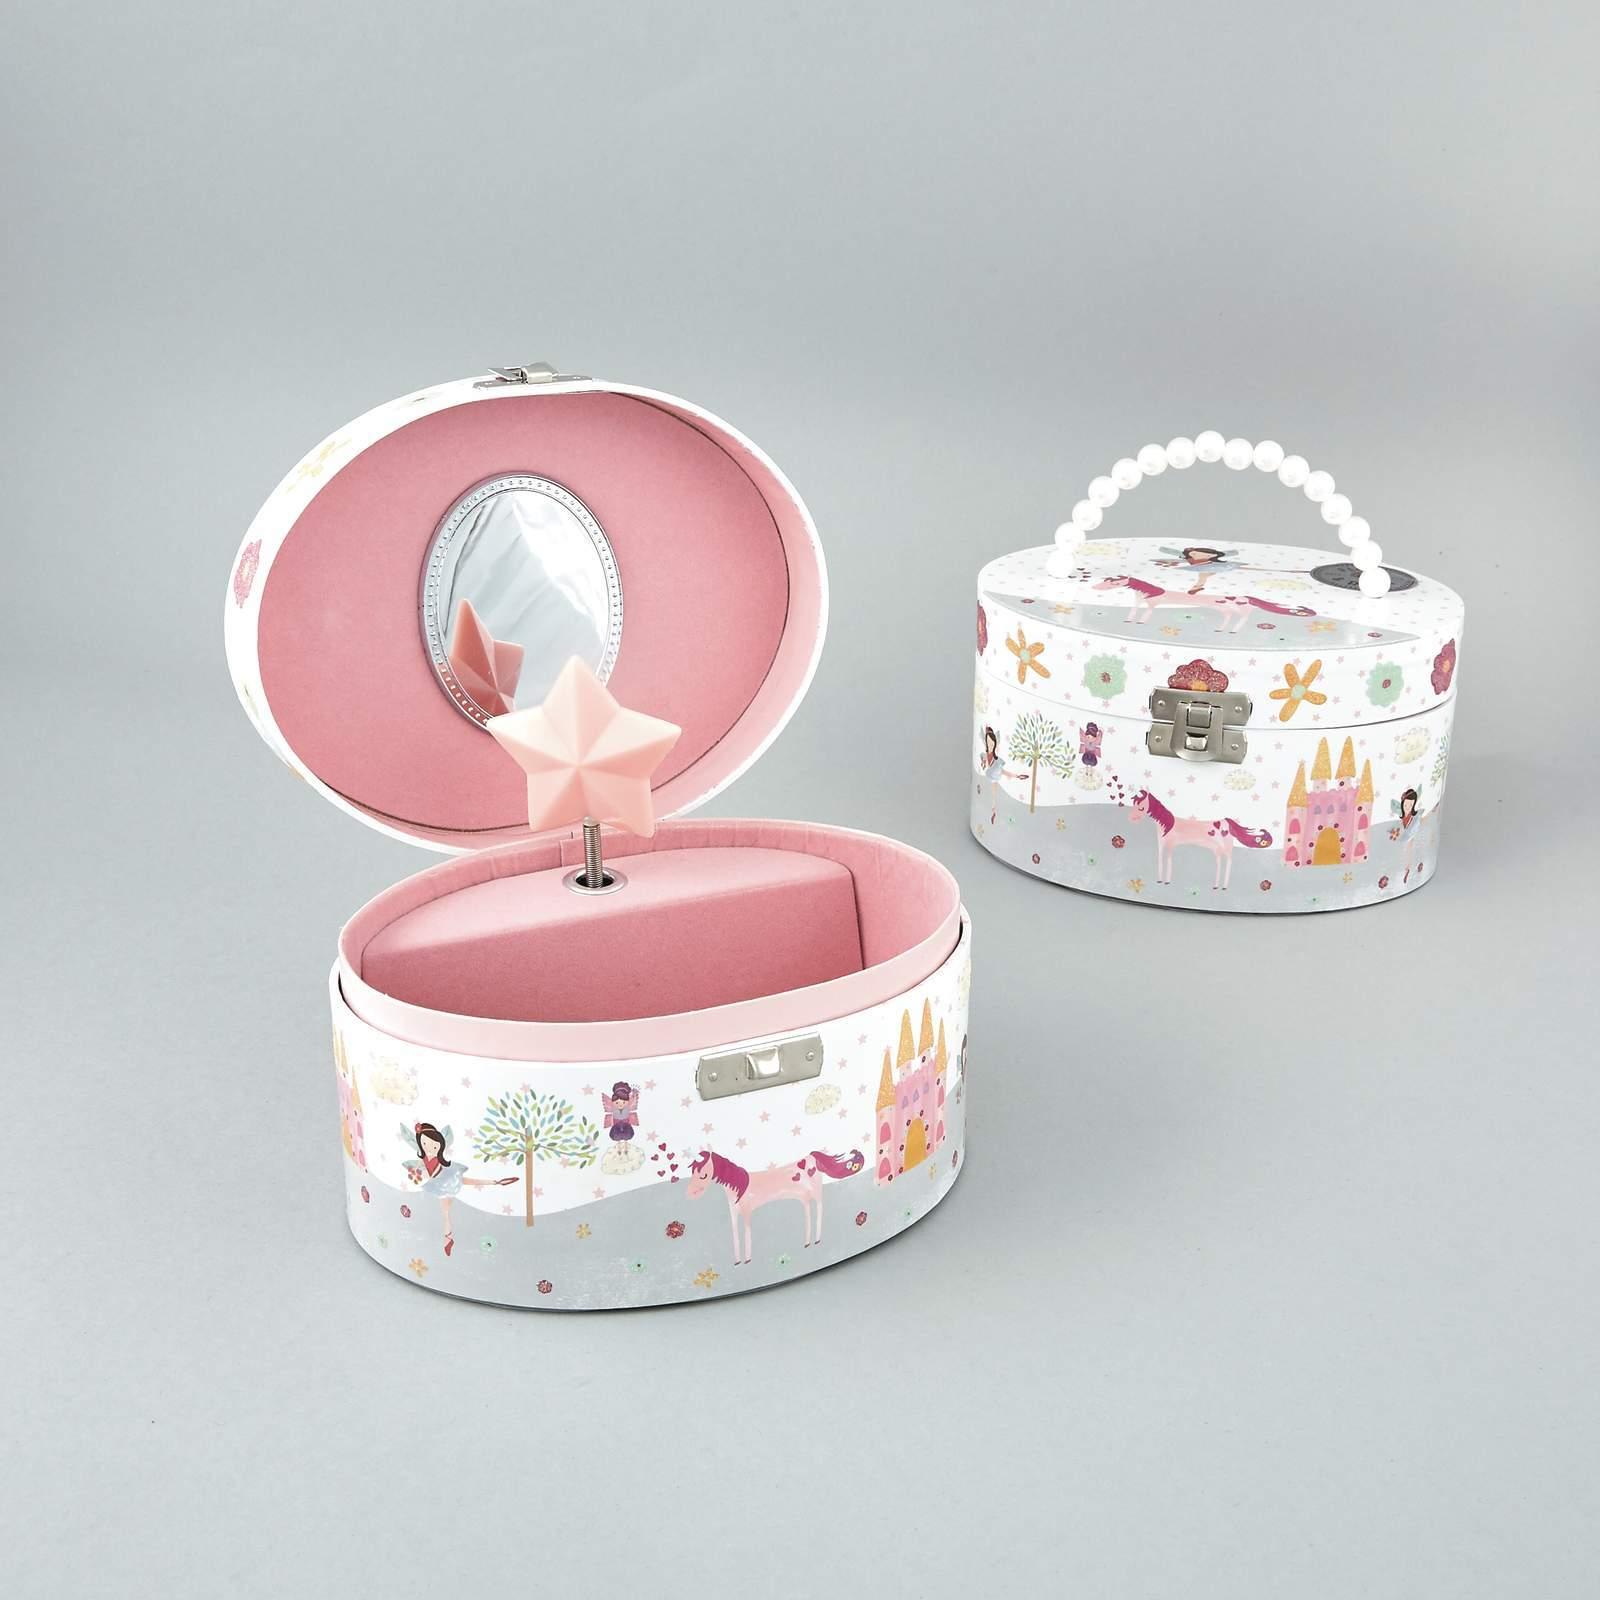 Stunning Unicorn Shaped Mirror Gift Set Pink